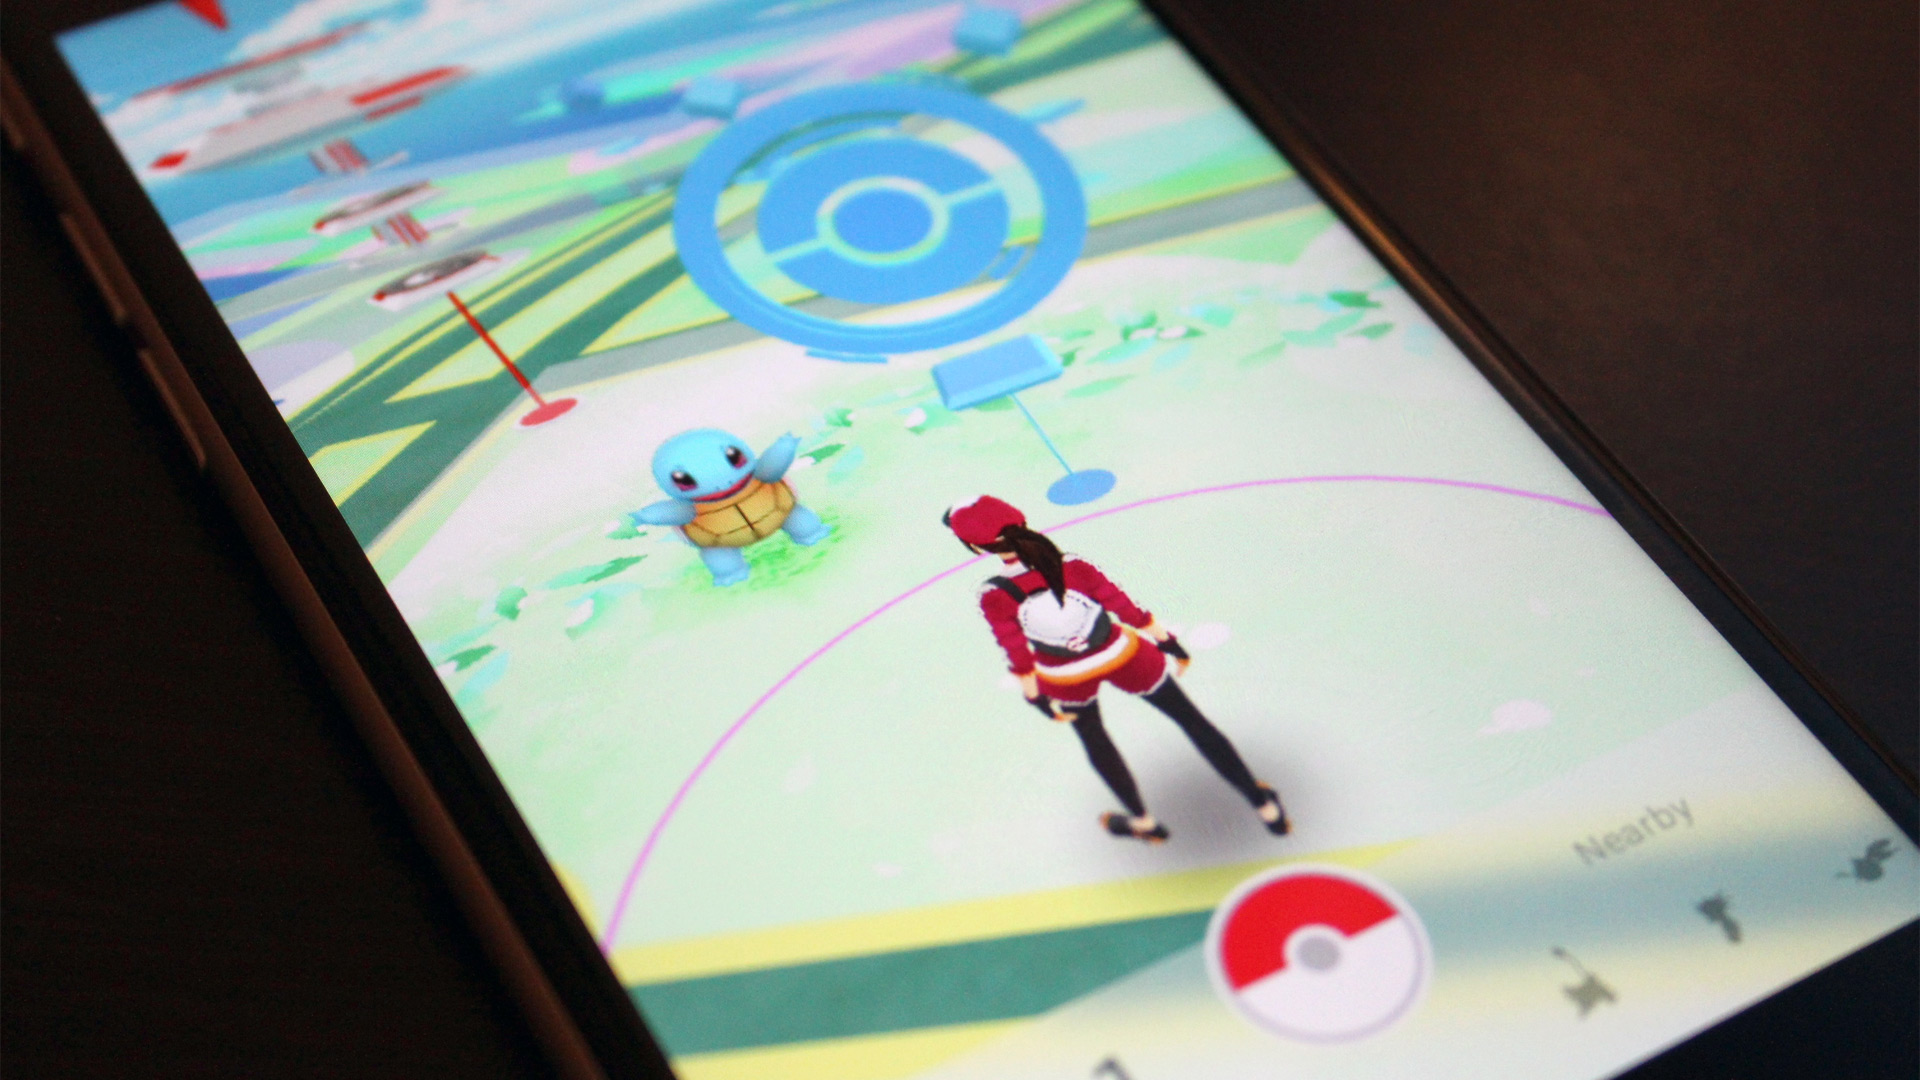 New Pokémon Go details and video emerge